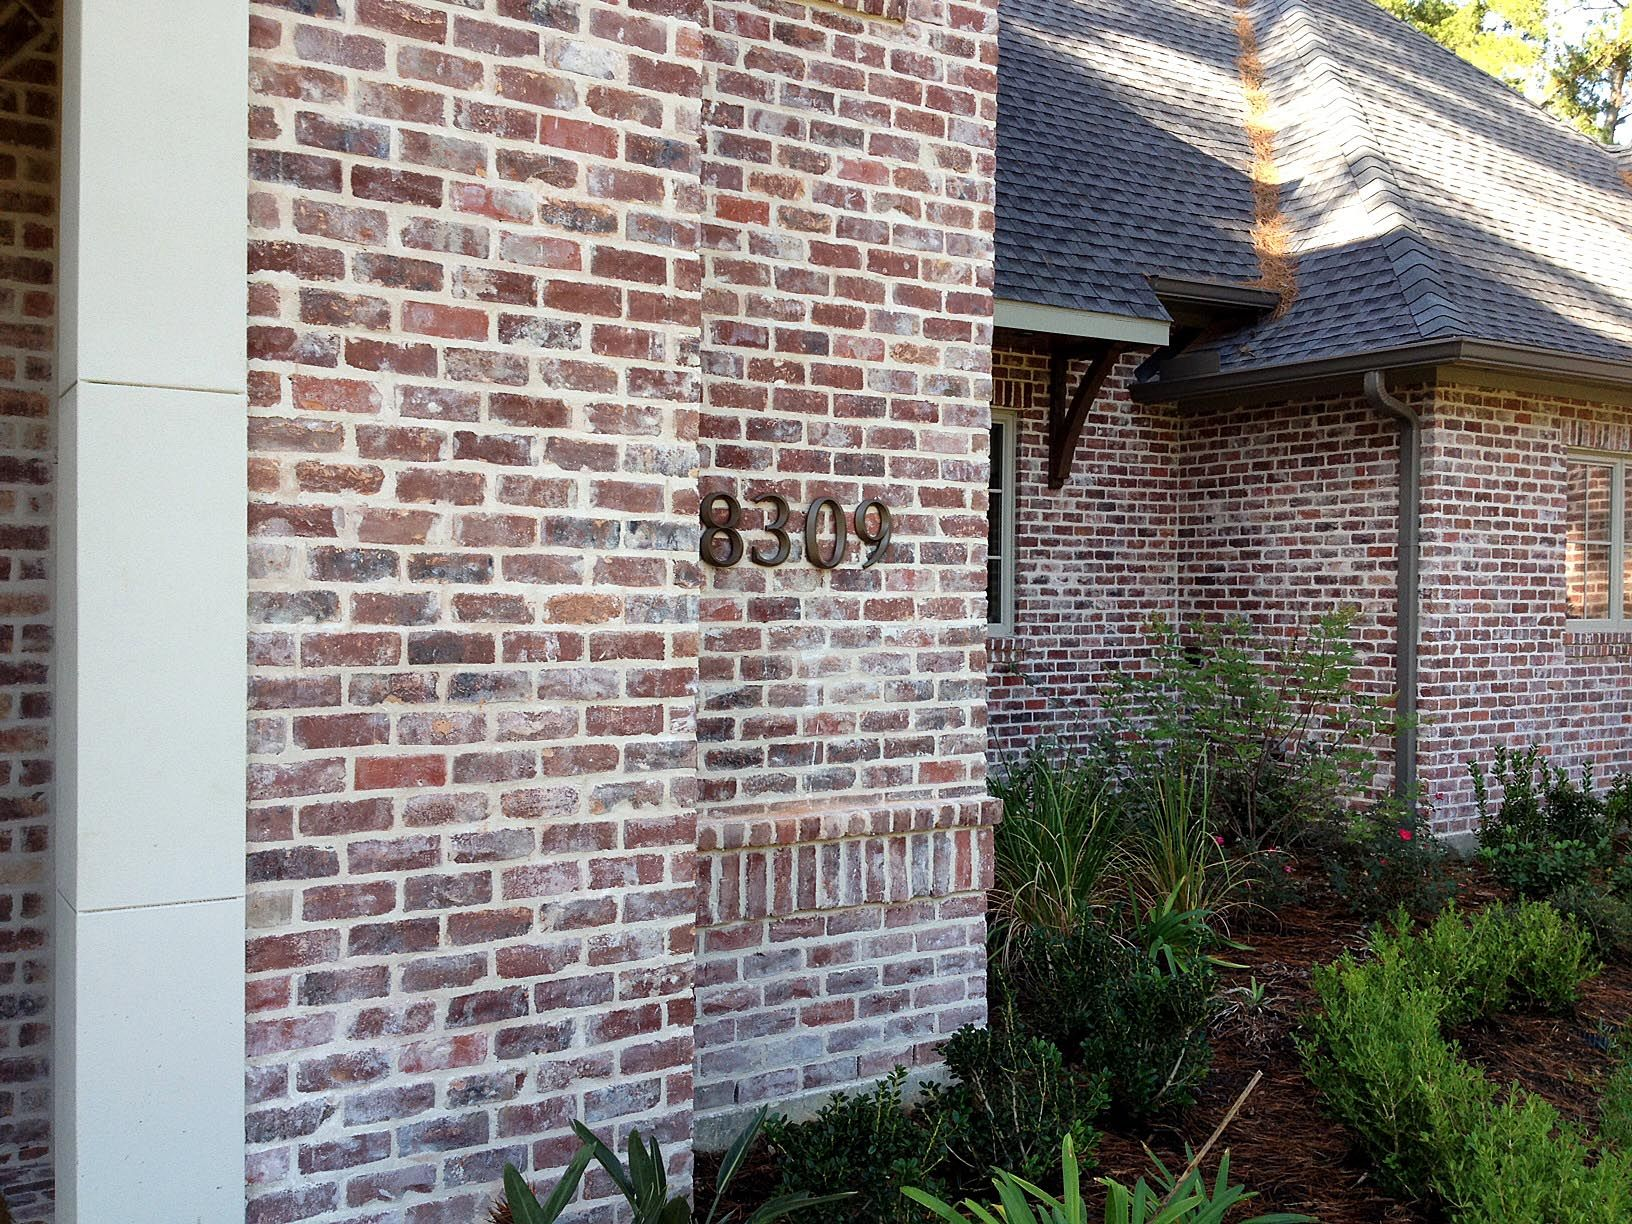 San Luis No Orange Q White Mortar Flush Cut Technique View A  Everett  HouseBrick ...